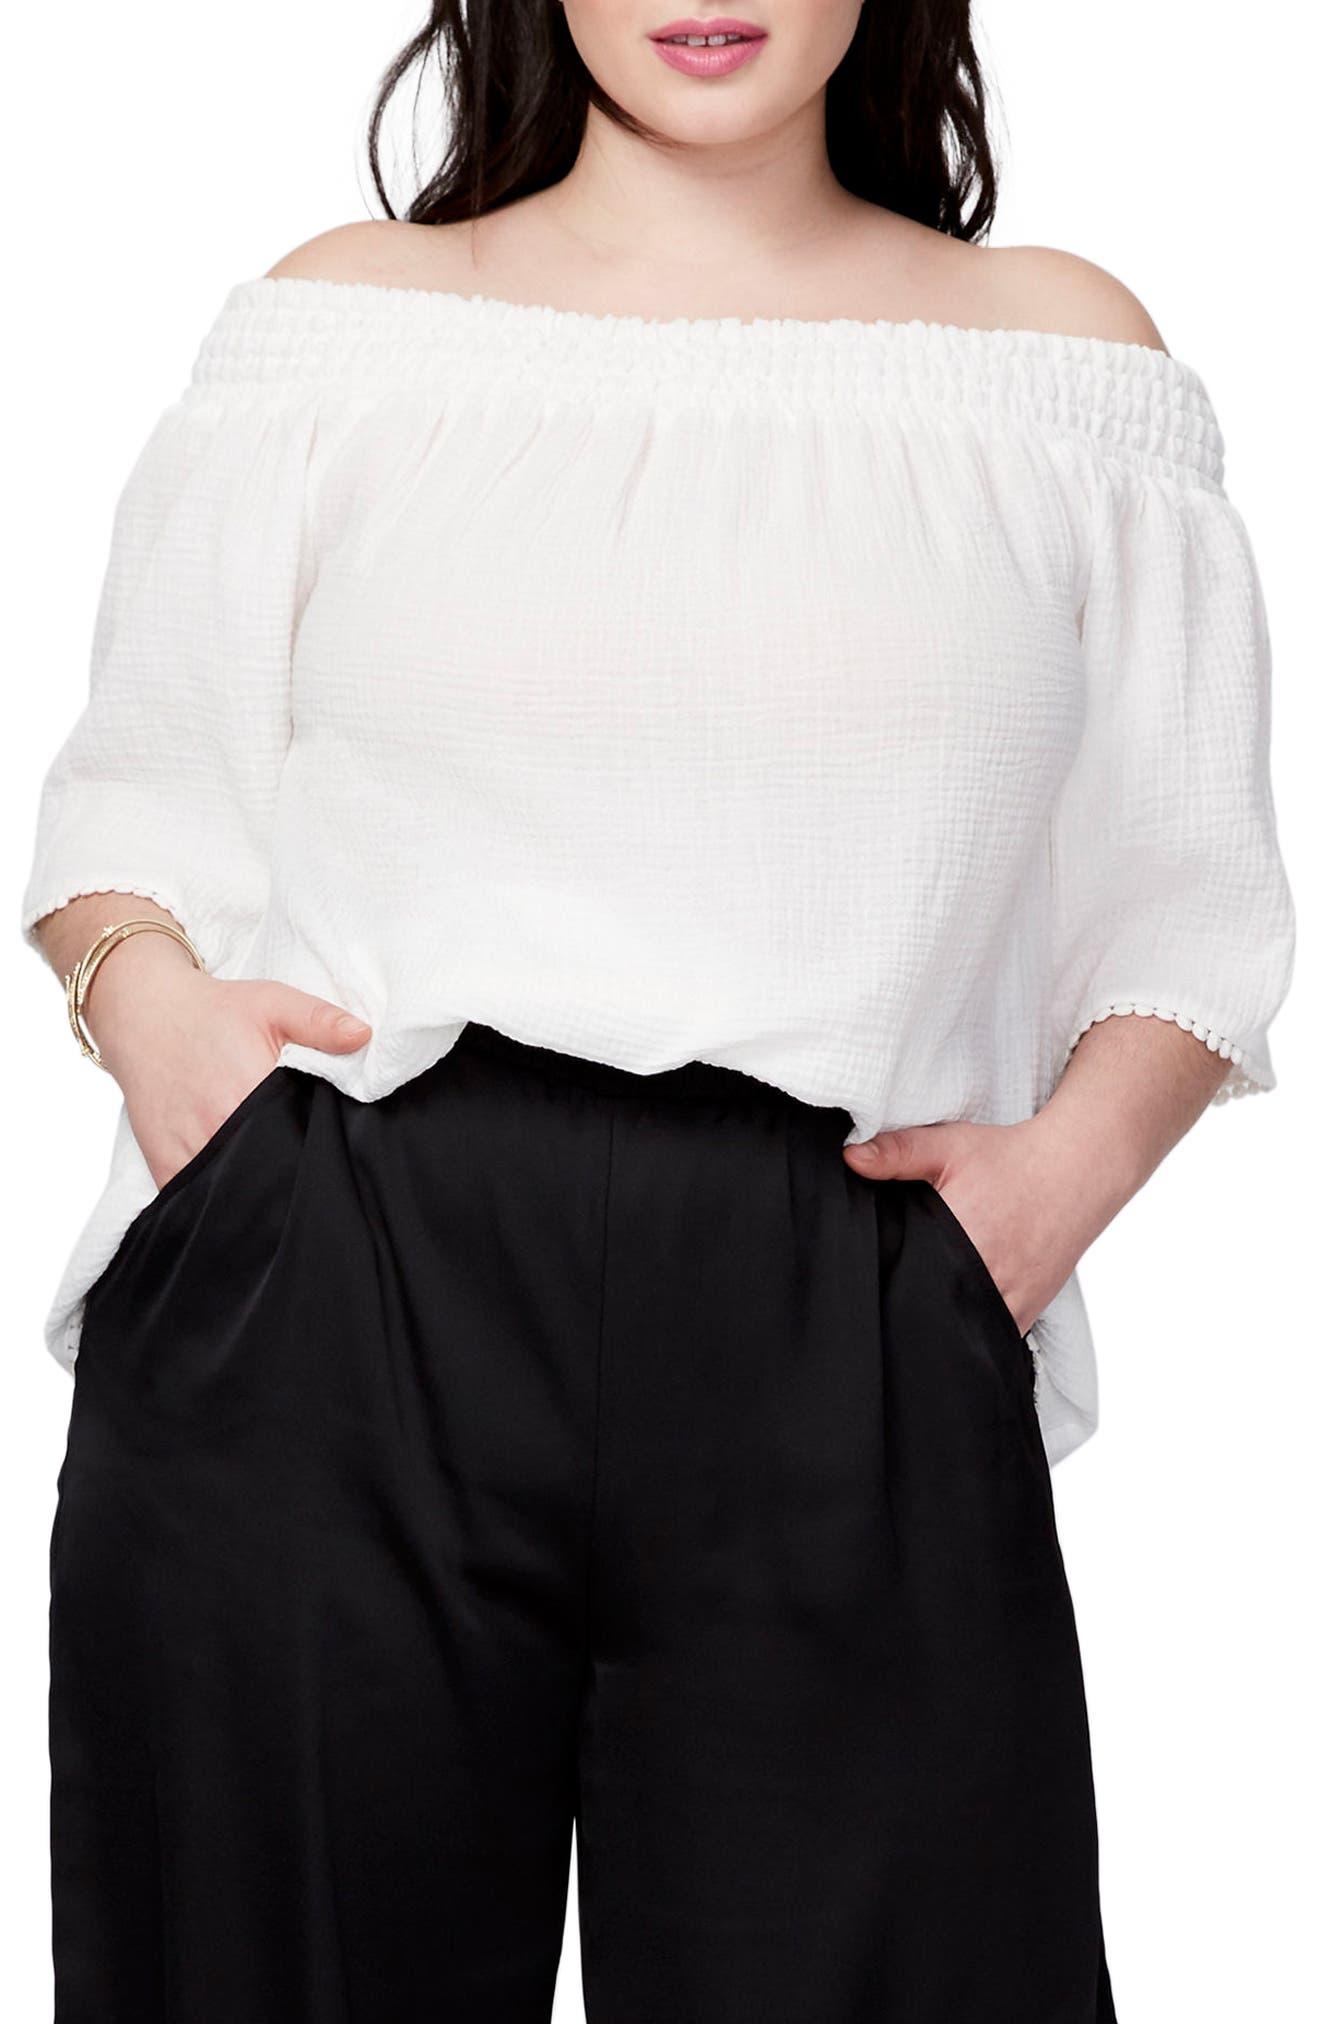 Main Image - RACHEL Rachel Roy Smocked Off the Shoulder Top (Plus Size)